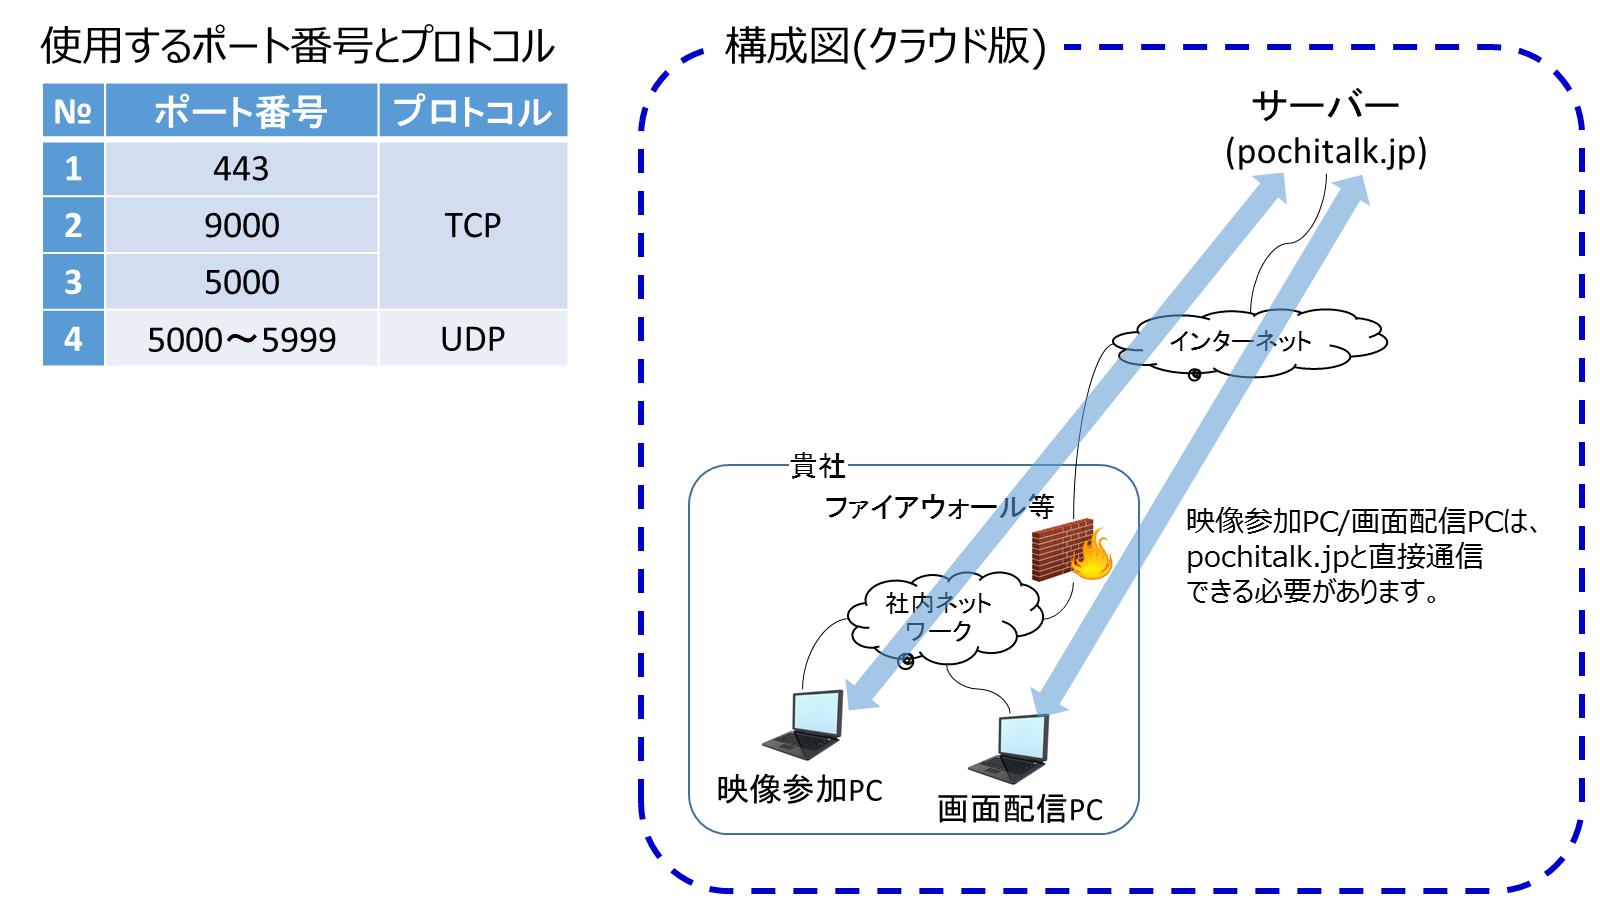 pochitalk_image-network-requirements